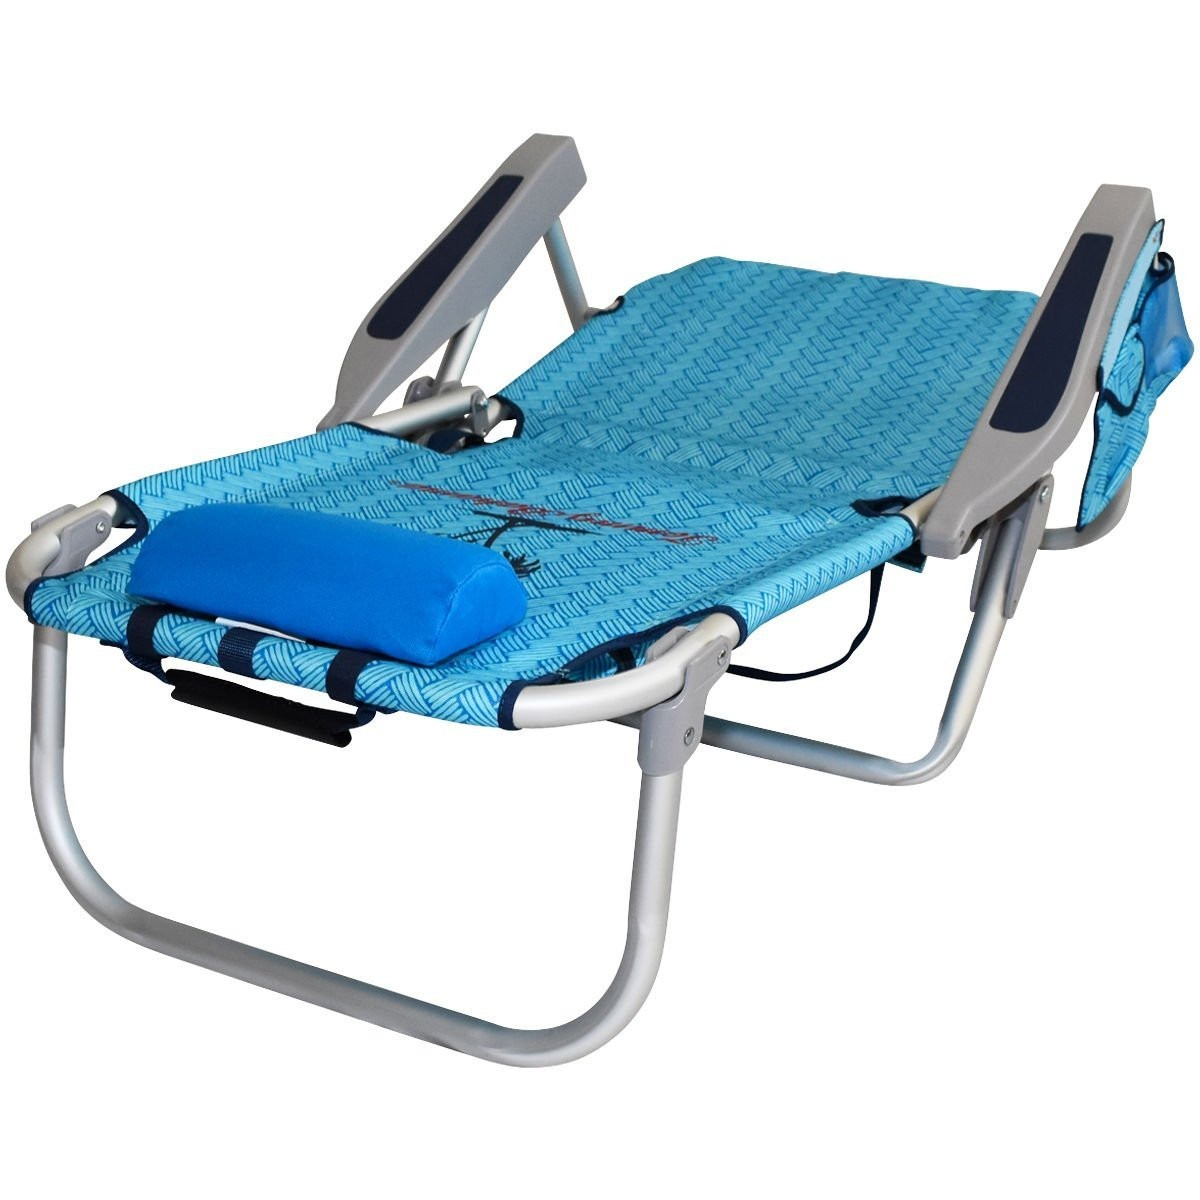 backpack folding chair bouncy chairs for babies mamas and papas silla playa mochila aluminio tommy bahama, camastro - $ 1,090.00 en mercado libre